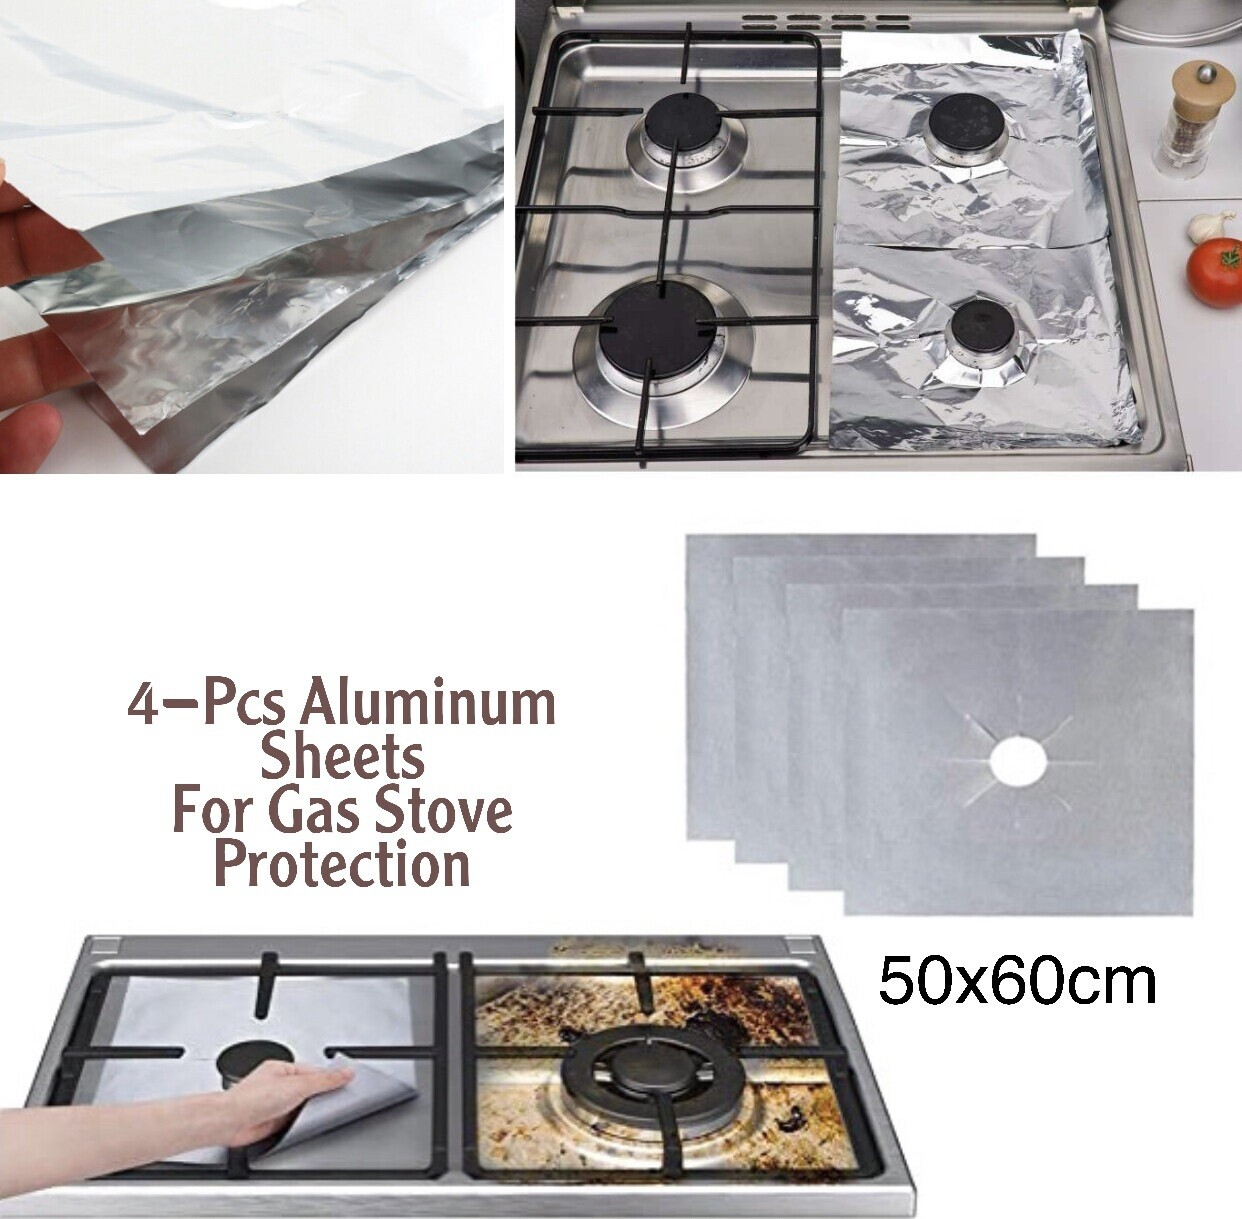 Aluminum Stove Sheets